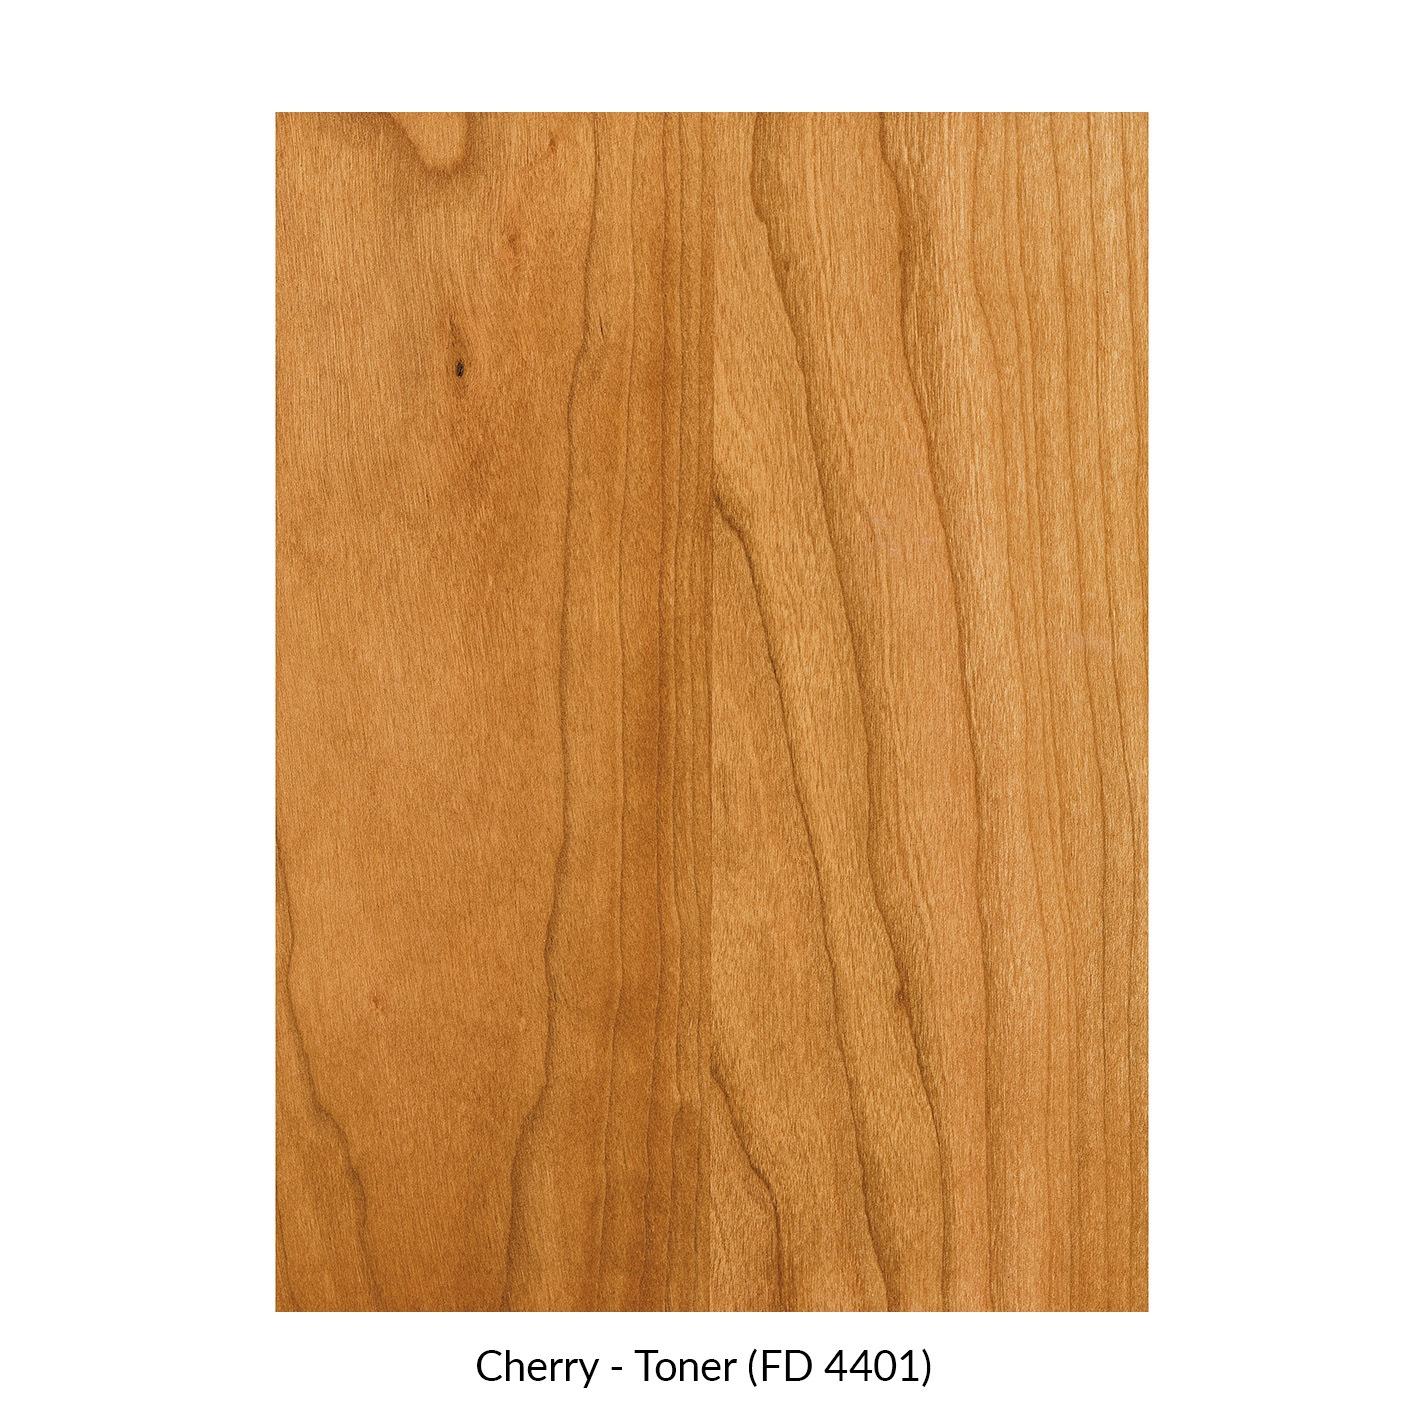 spectrum-cherry-toner-fd-4401.jpg